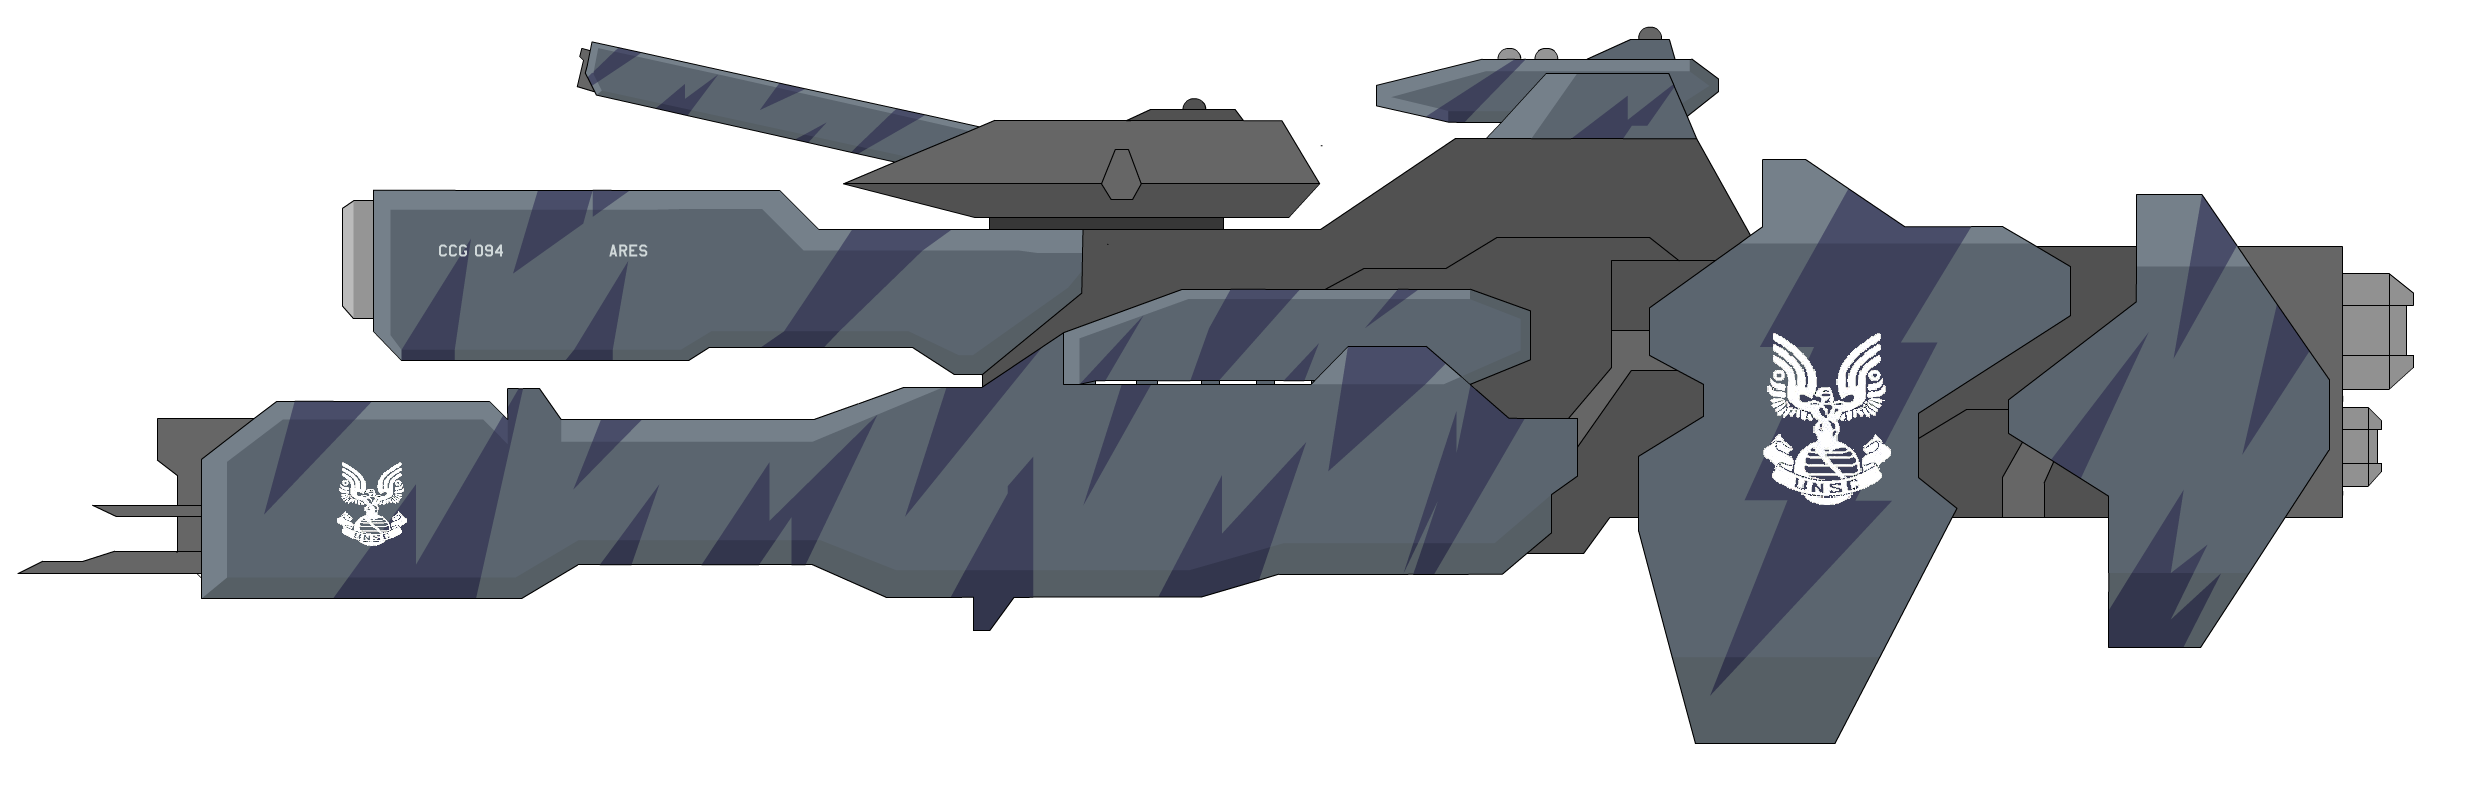 UNSC Alligator